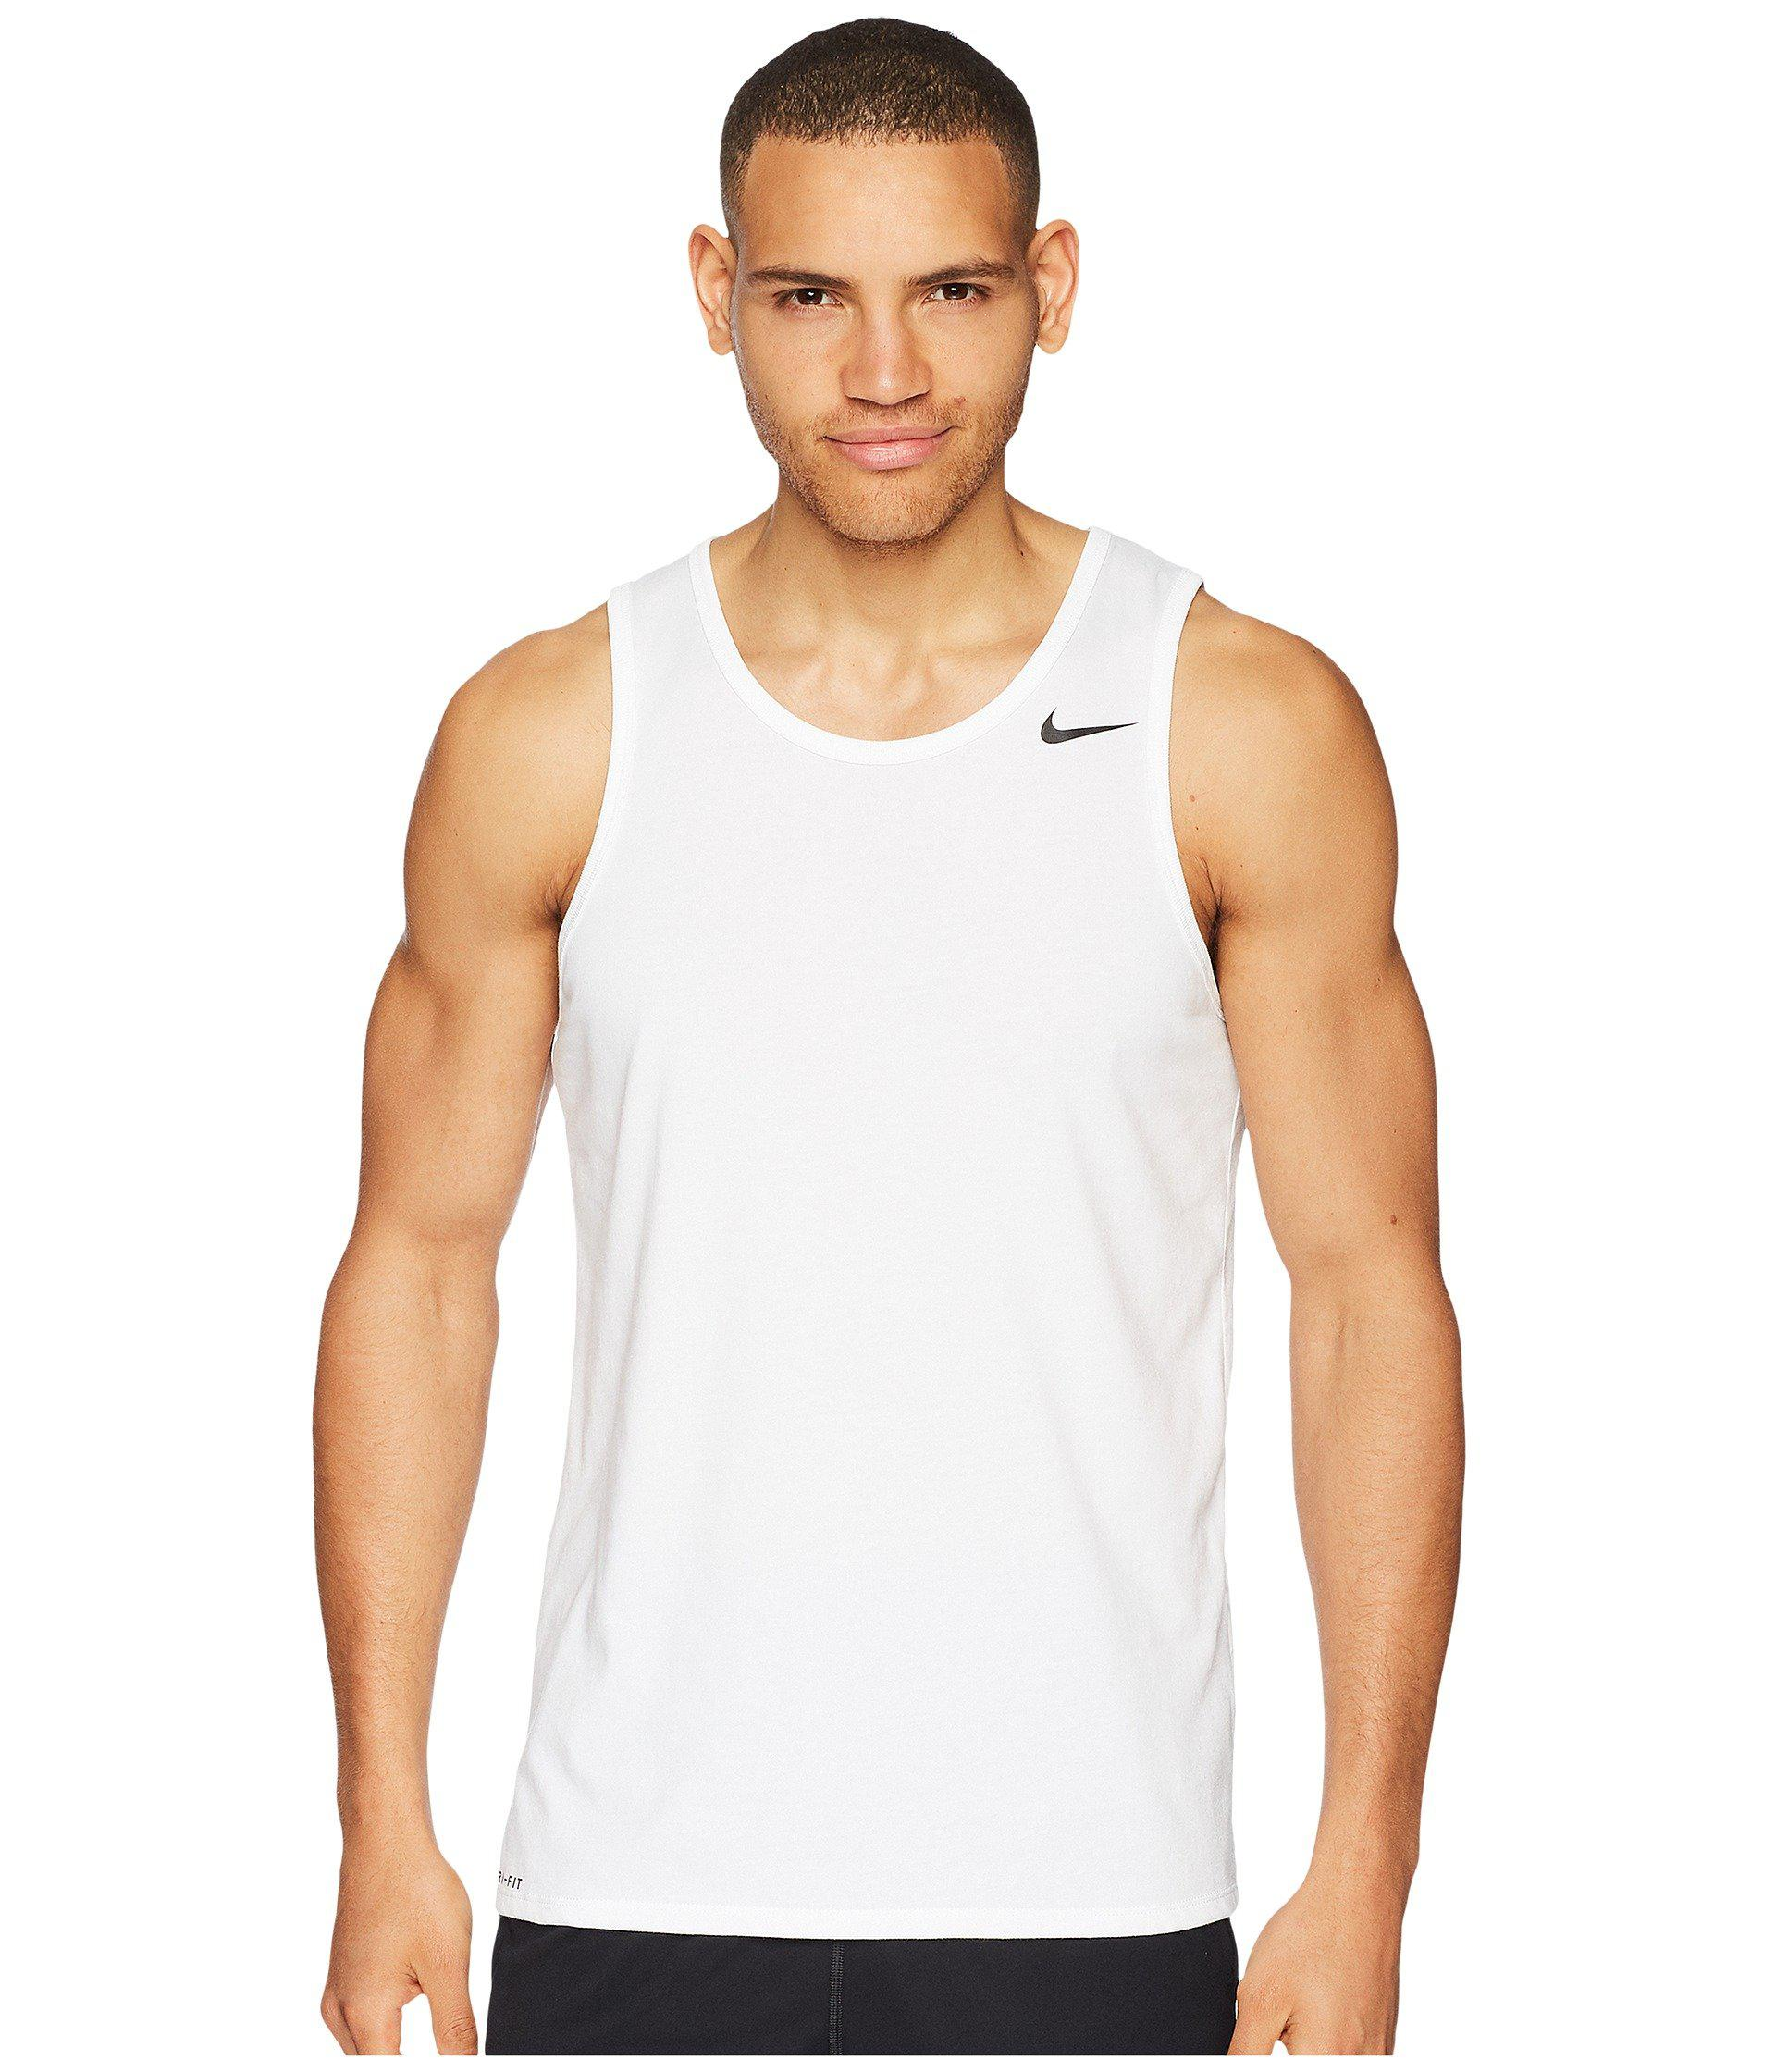 bfca1eedf06b Lyst - Nike Dri-fit Tank Top (white black) Men s Sleeveless in White ...